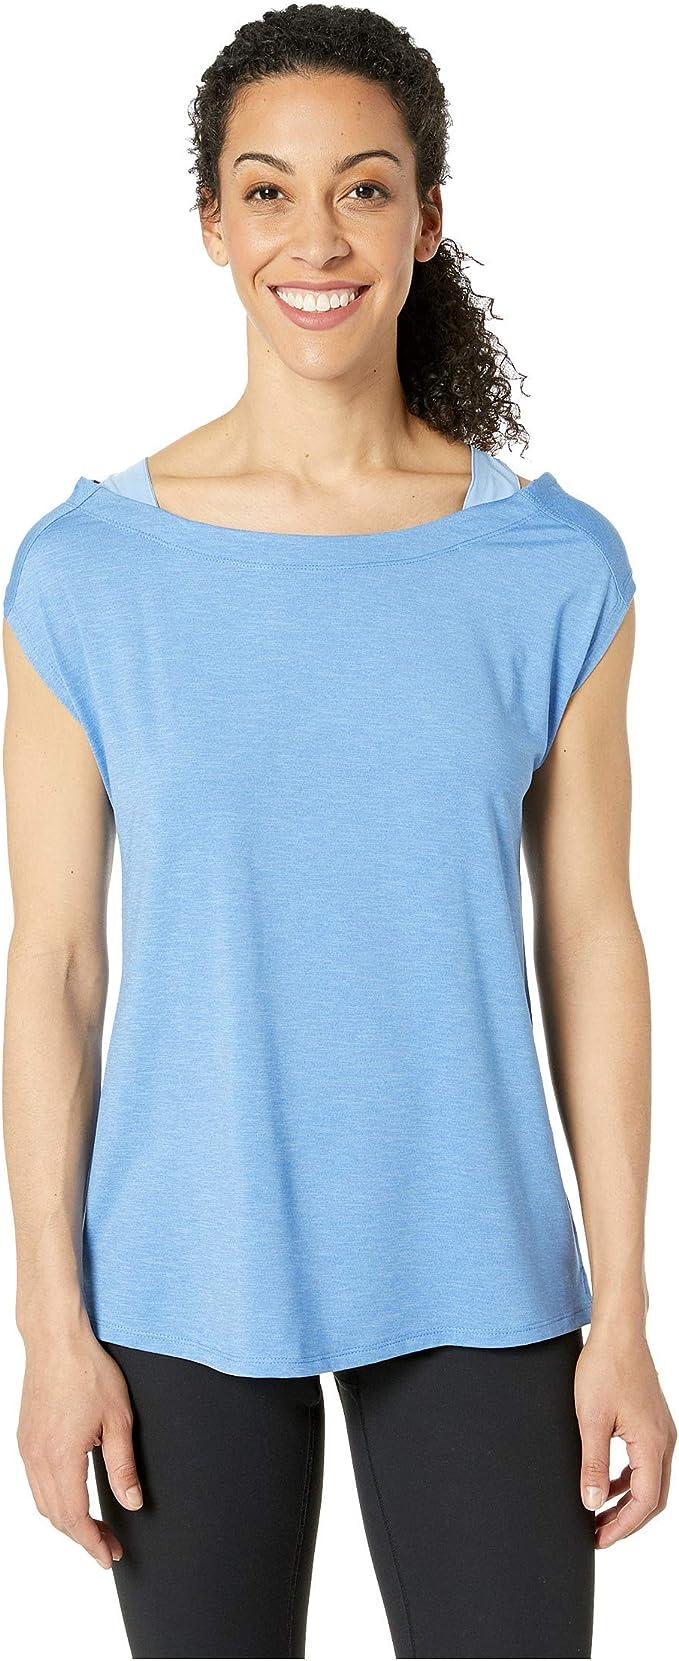 Details about  /Columbia Women/'s T-Shirt Top Plus Size 2X Blue Long Sleeves Polar Bear Cotton